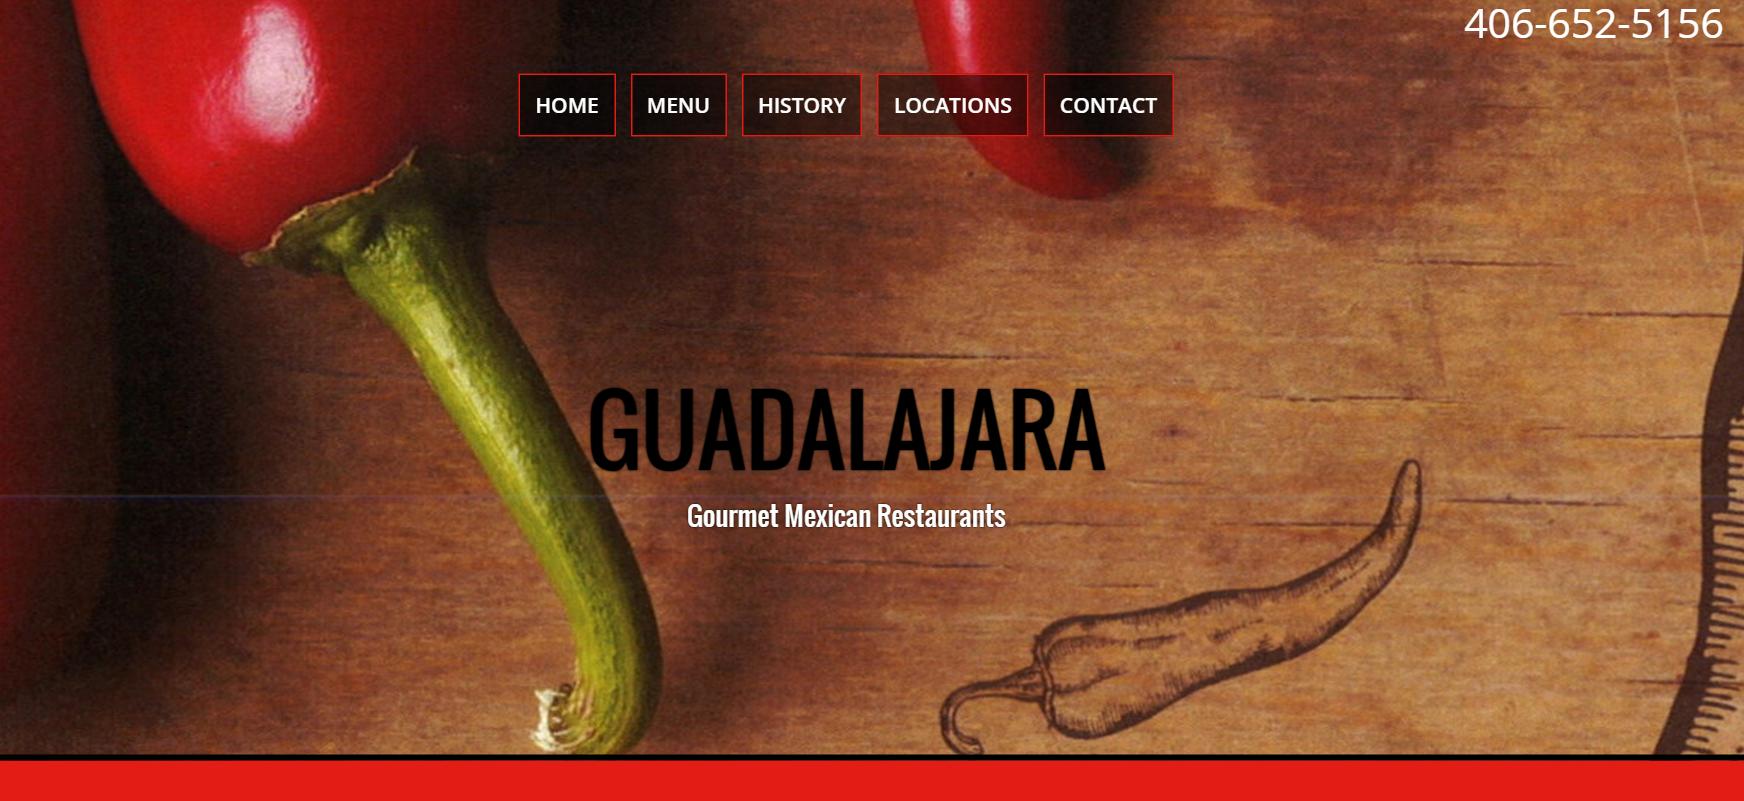 Guadalajara Mexican Restaurant Website Design by SkyPoint Studios